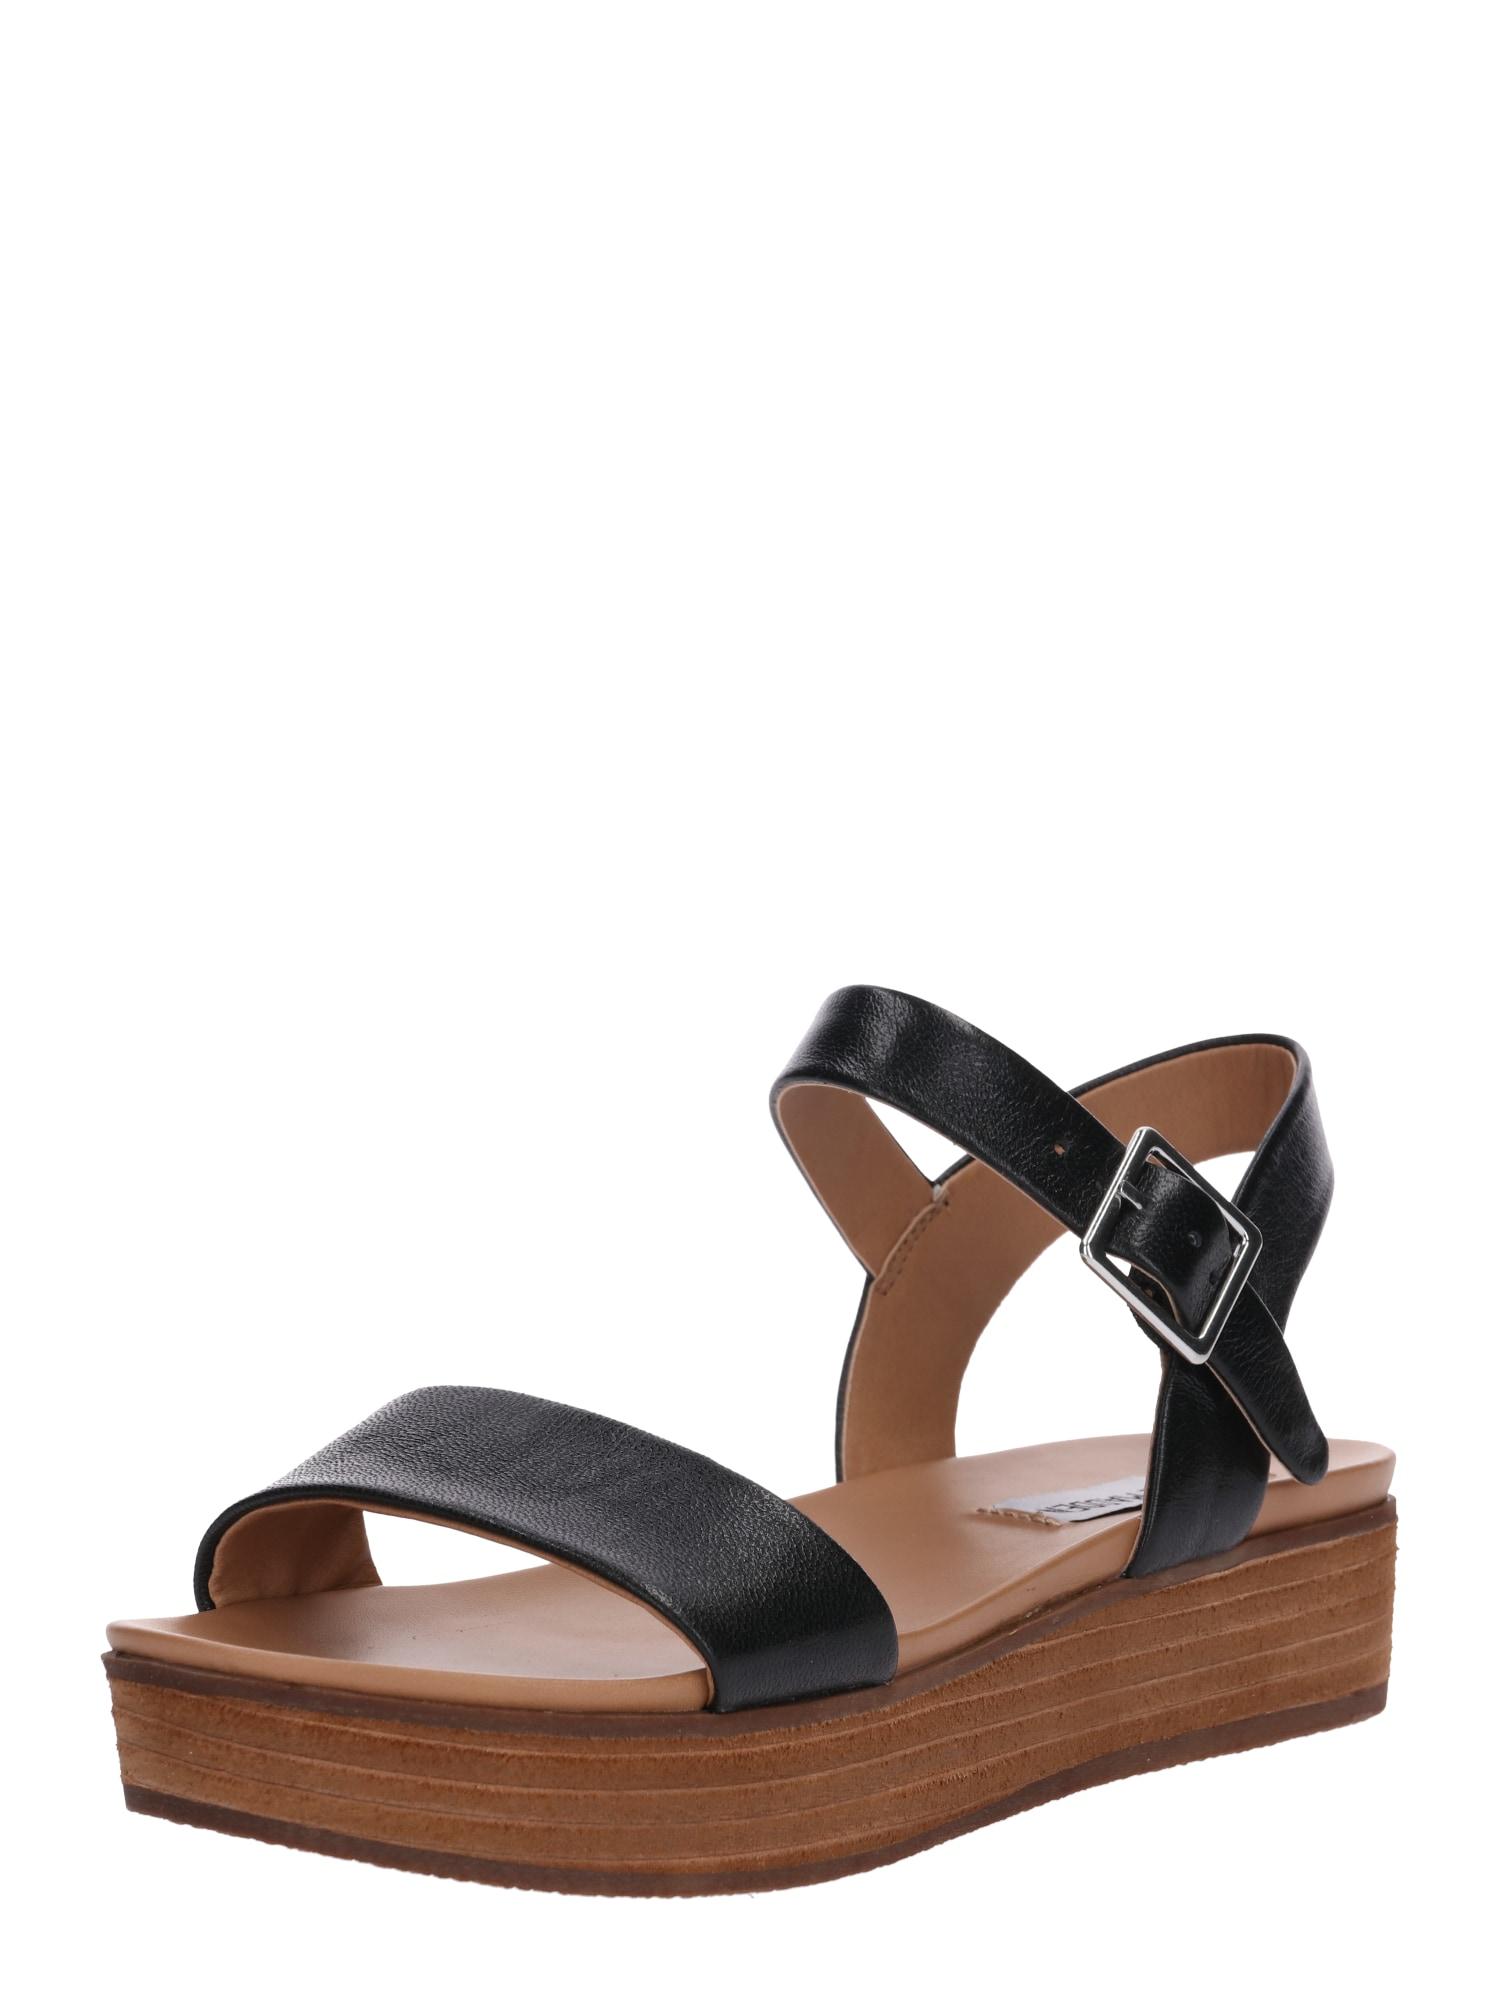 Páskové sandály AIDA černá STEVE MADDEN